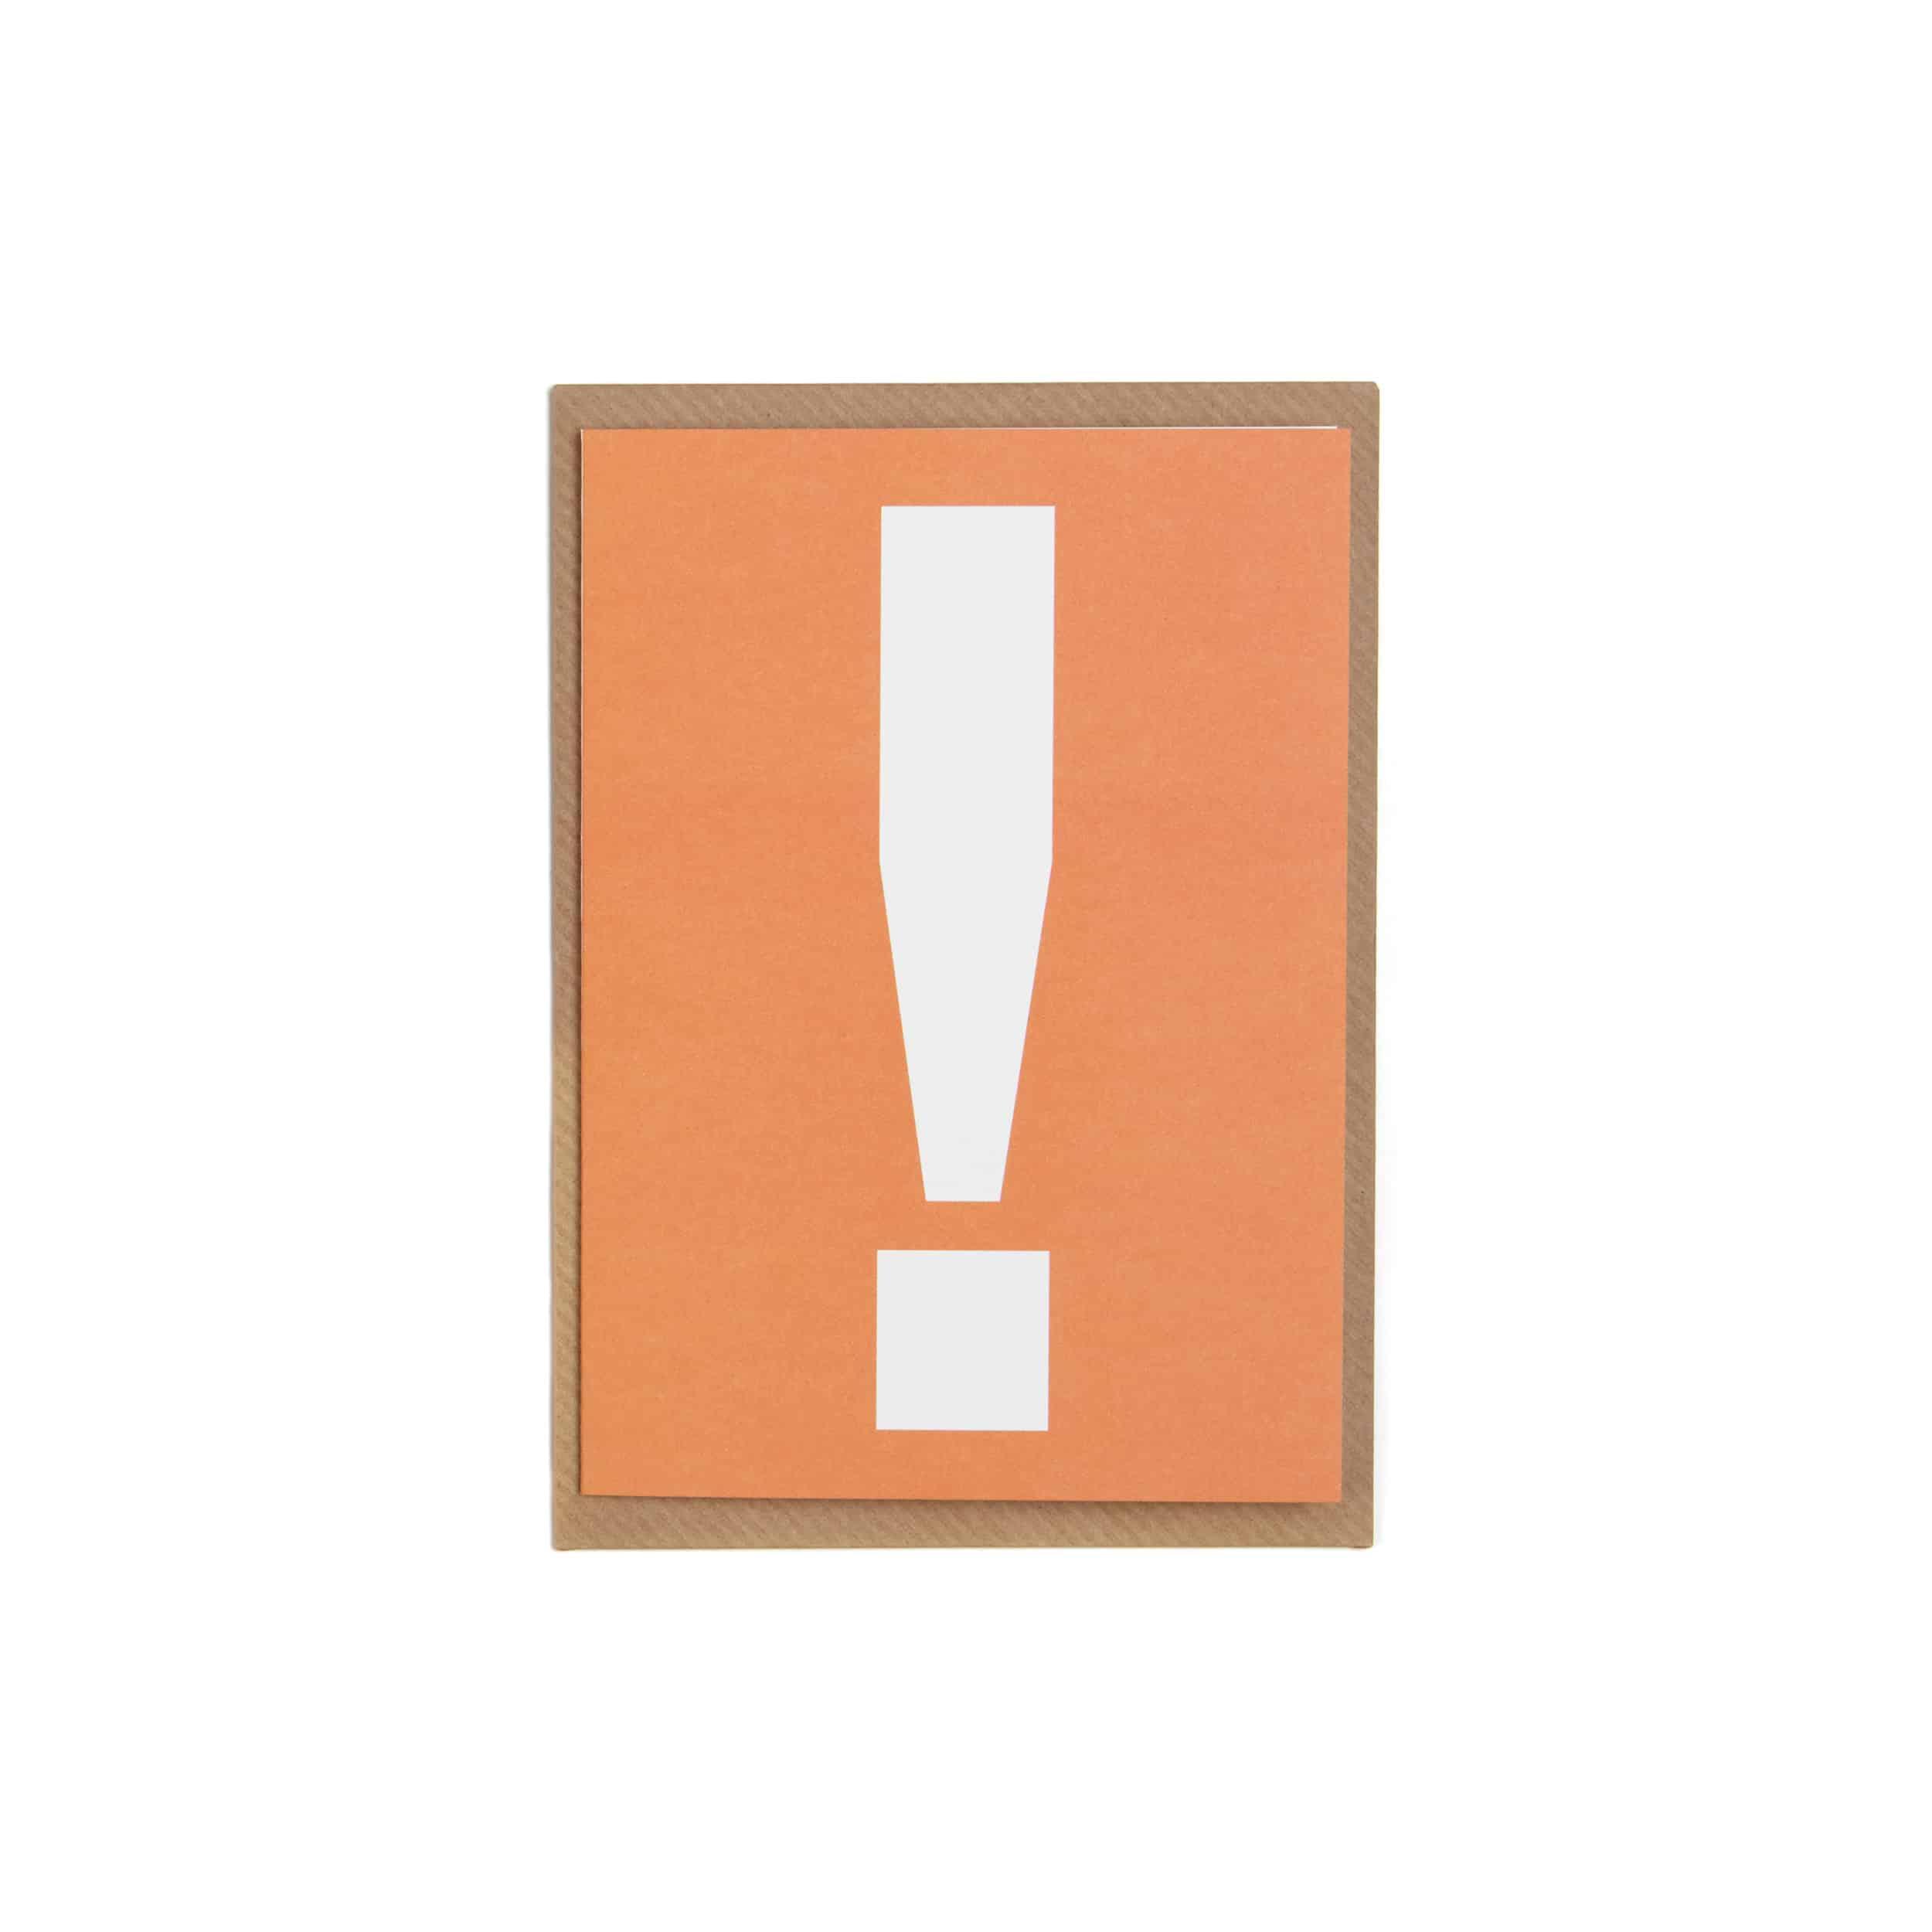 Stationery Another Country Palomino Diska Handbag Khaki Mark Fold Card Coral